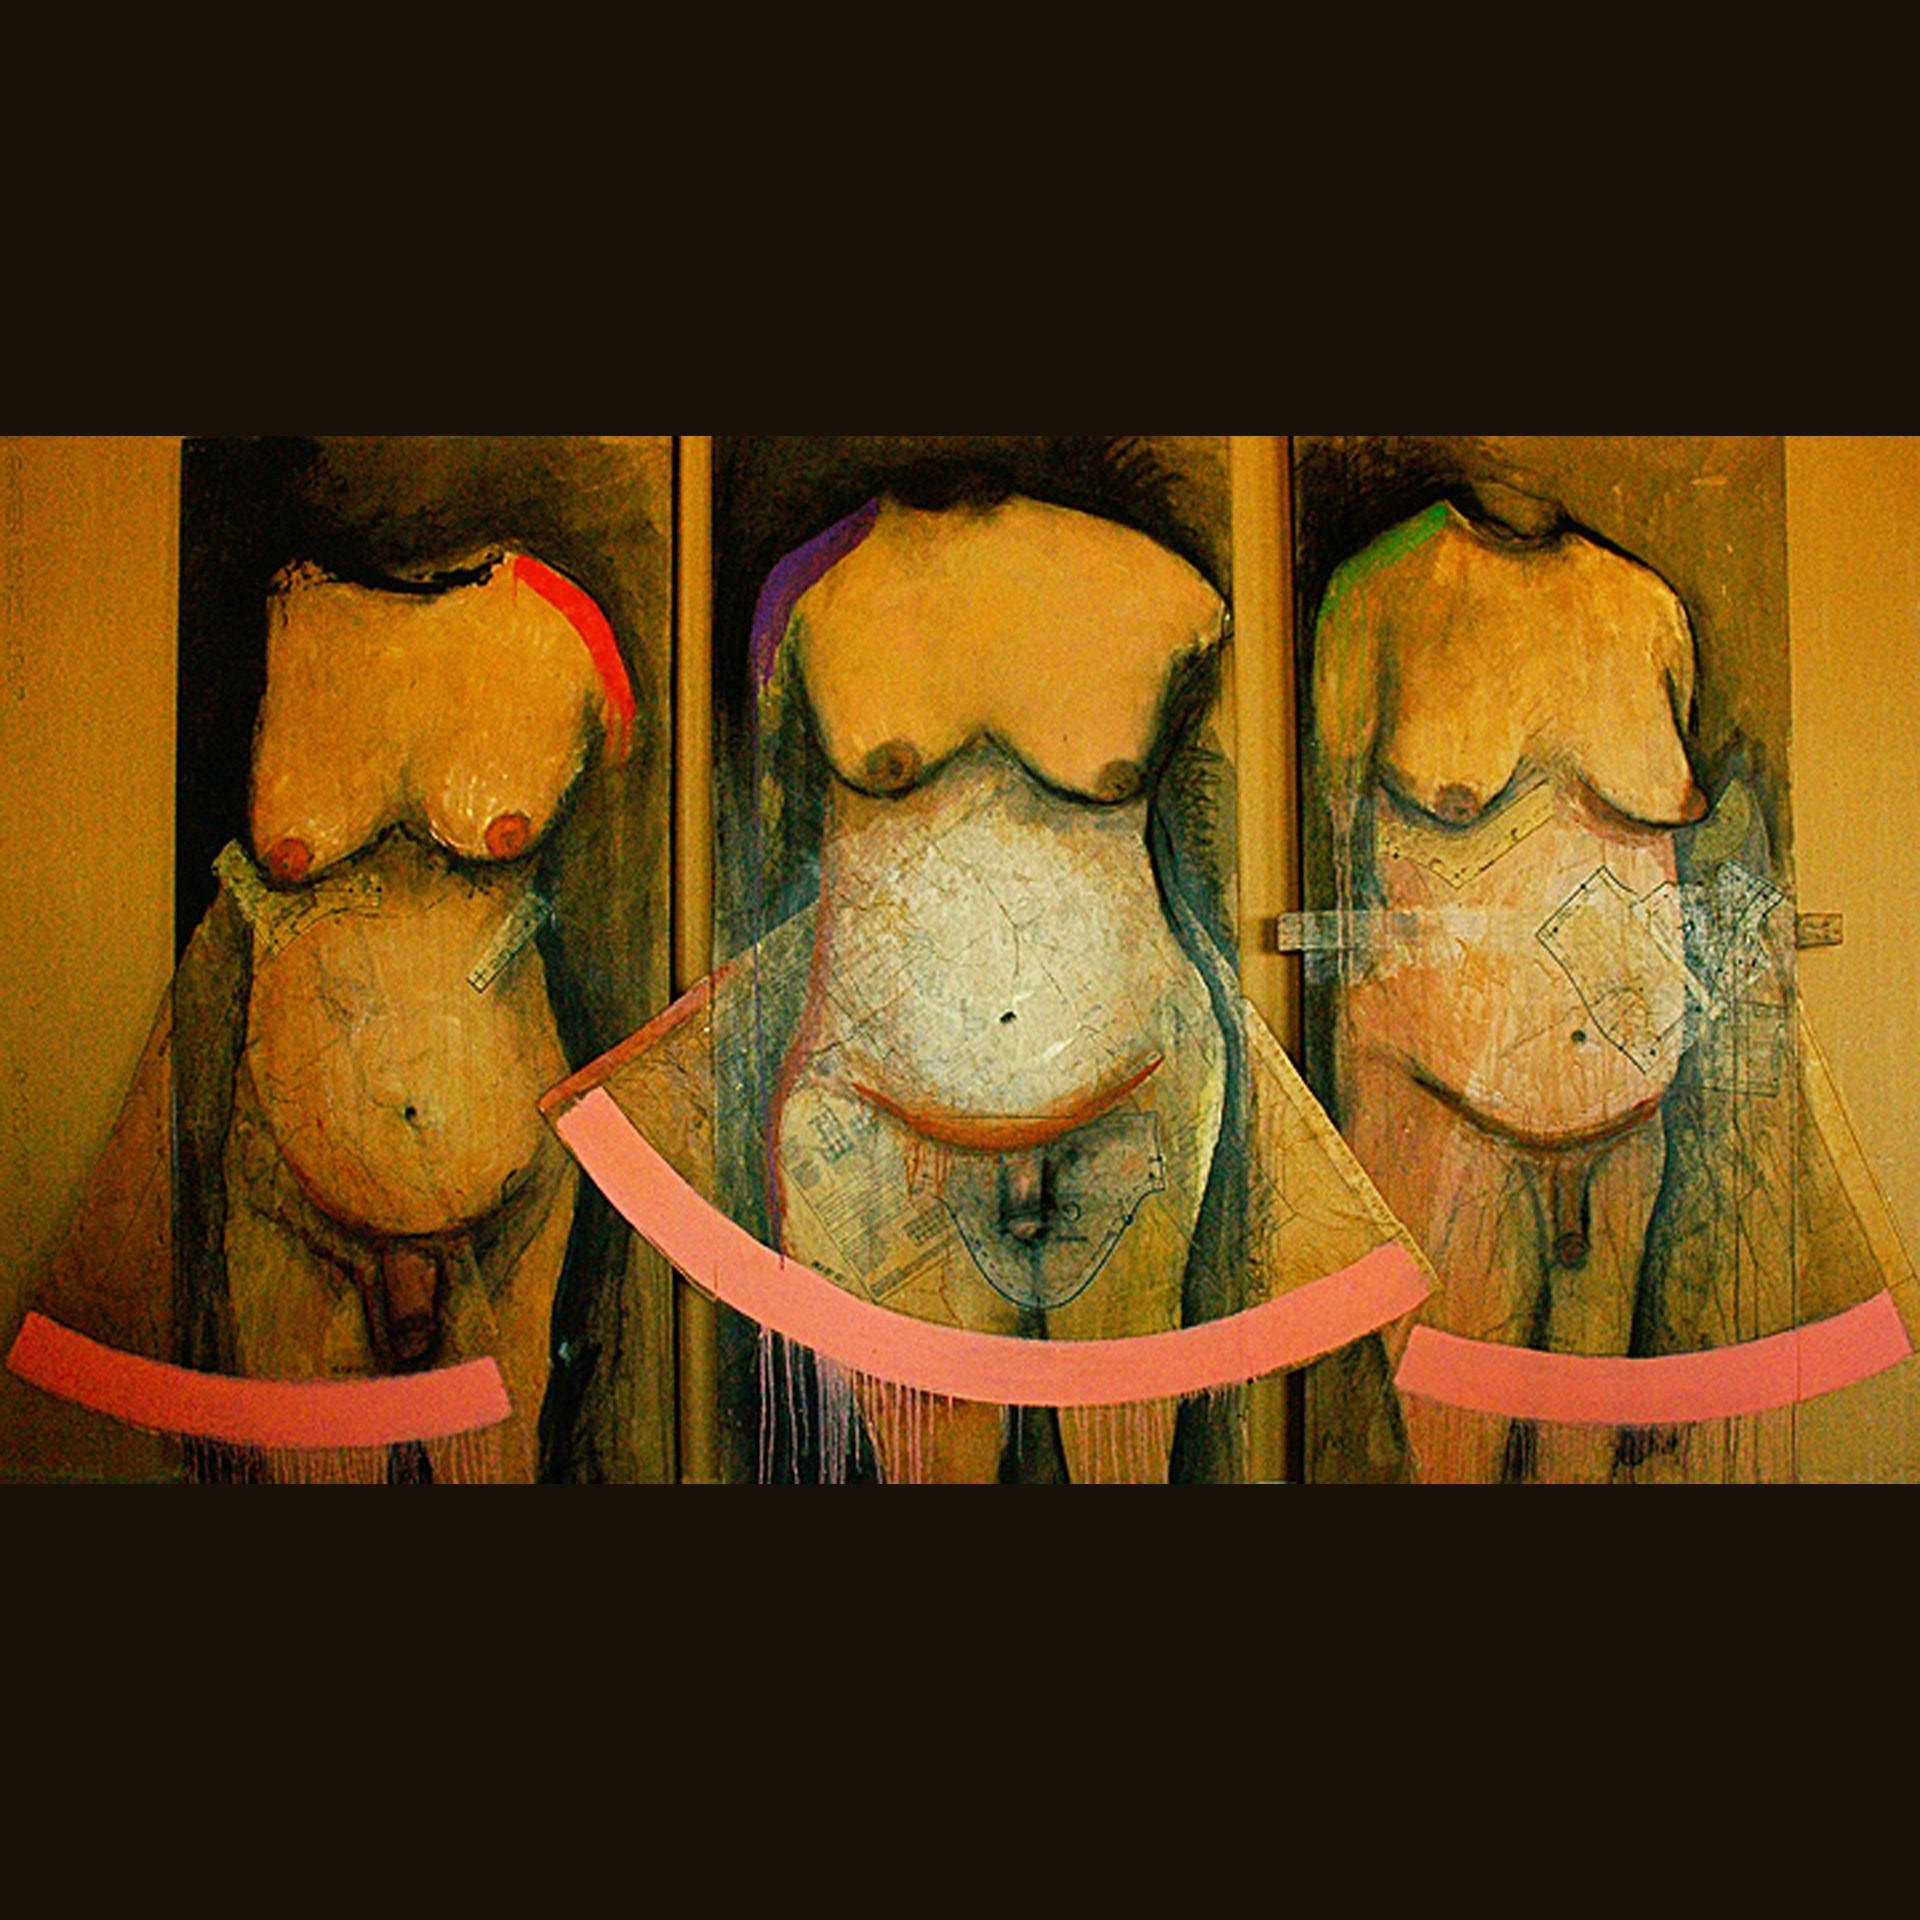 Skirts of Desire (Lania D'Agostino)